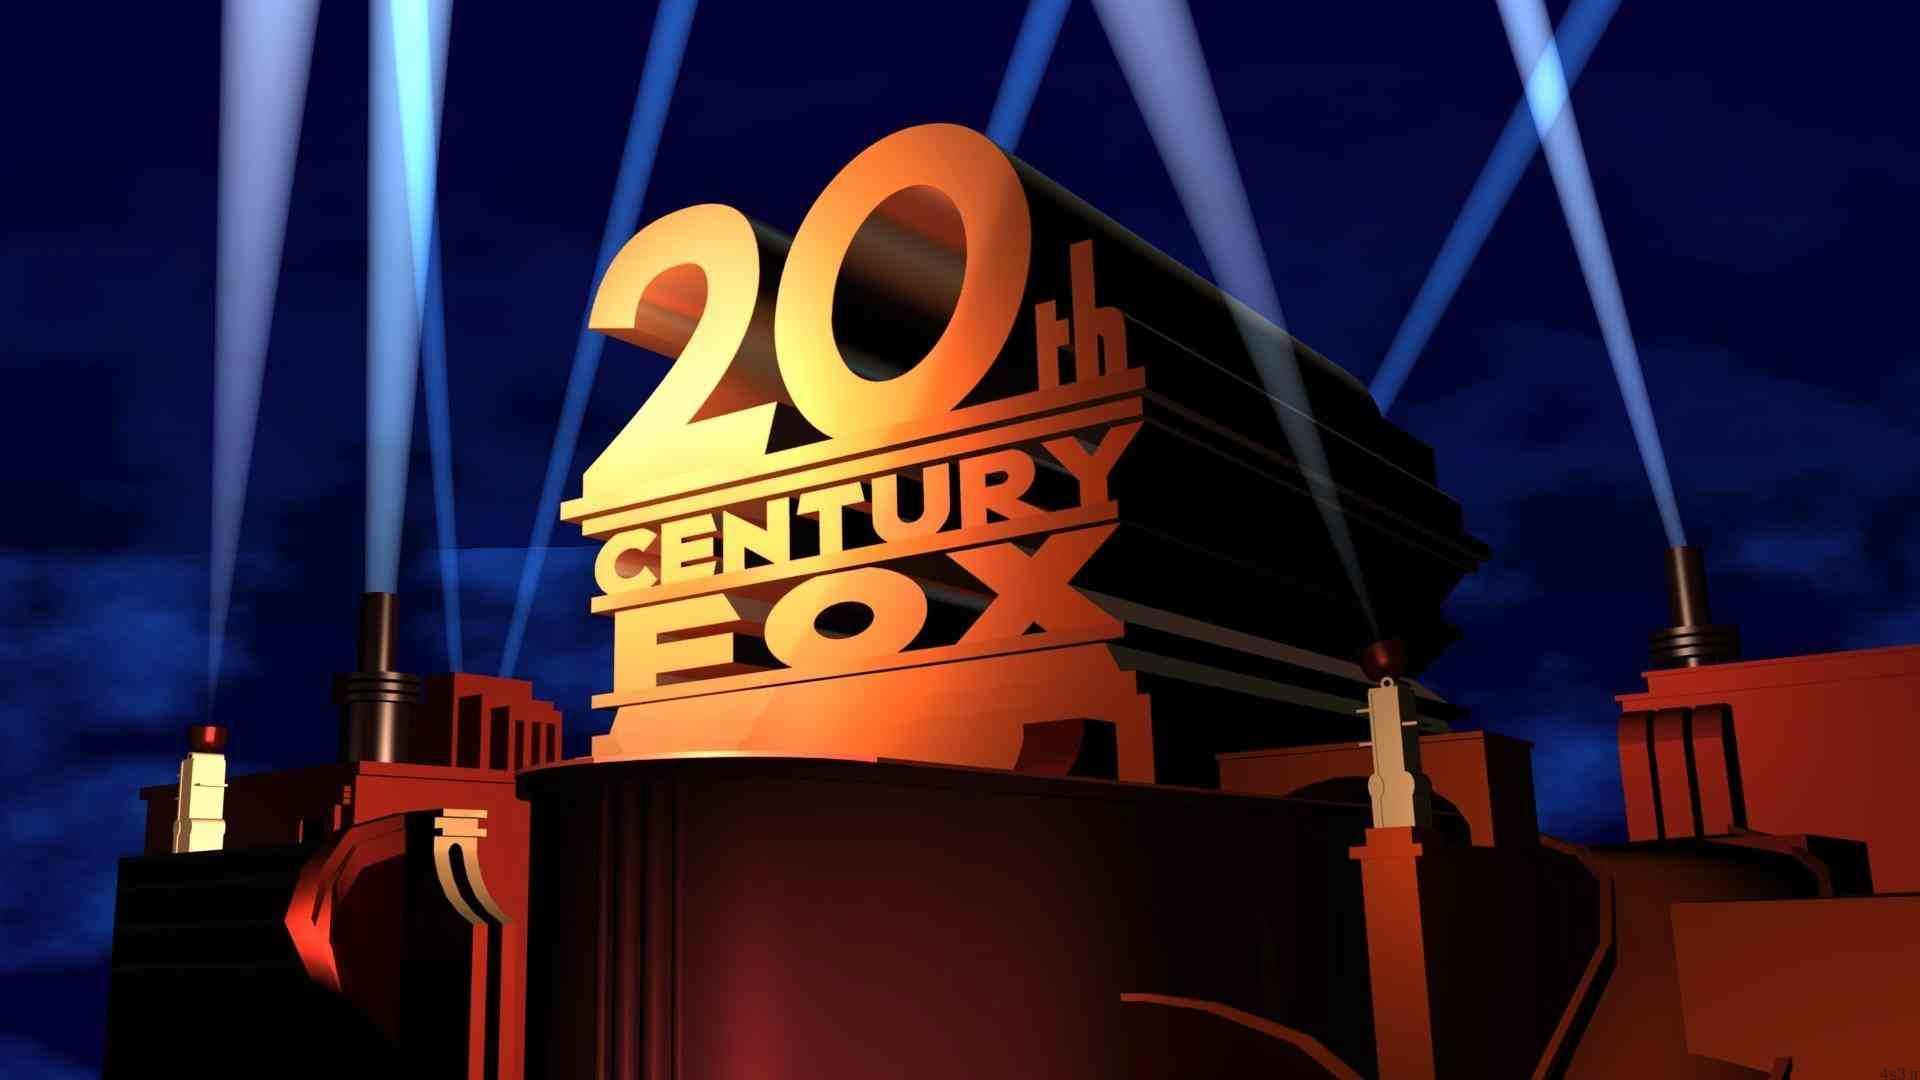 20th Century Fox Wallpapers 4s3 5 - تصاویر فاکس قرن بیستم | ۲۰th Century Fox Wallpapers